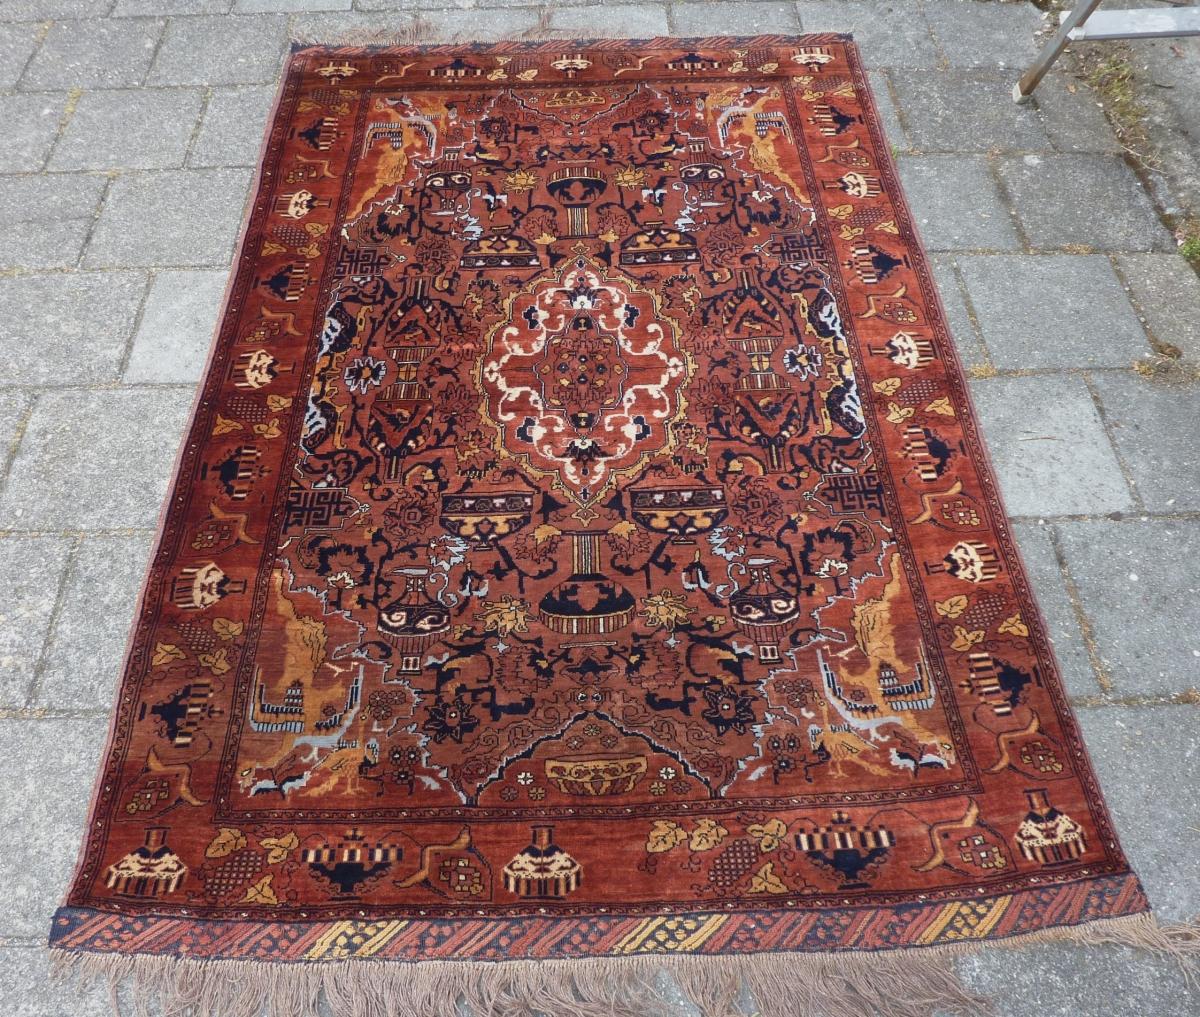 "East Persian Kashmar Rug, 199 X 132 Cm., 6' 6"" X 4' 4"